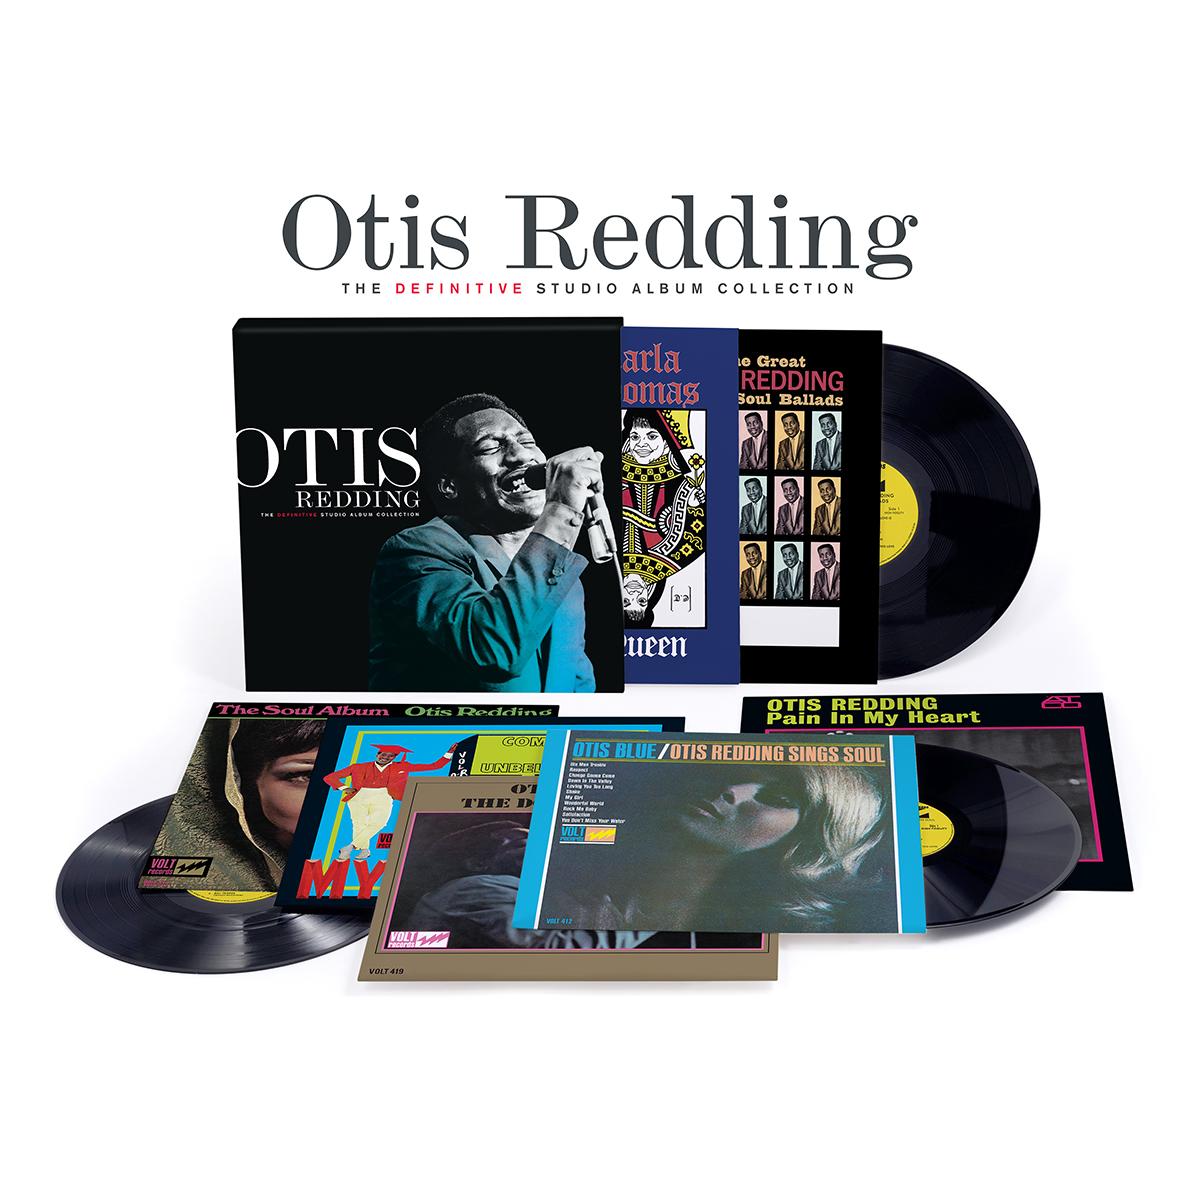 Otis Redding The Definitive Studio Album Collection - 140g Vinyl